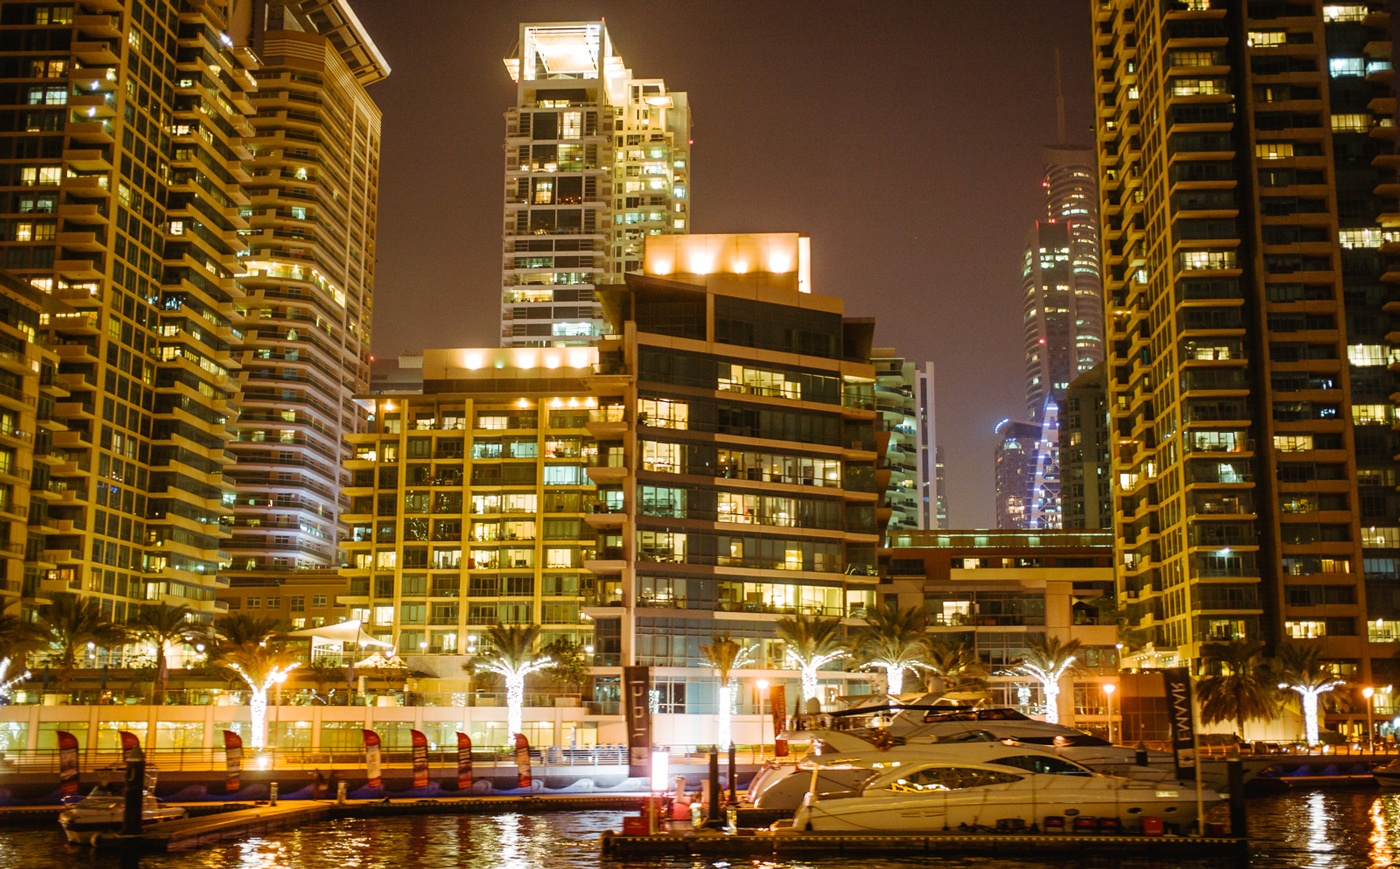 Dubai bei Nacht: Alles leuchtet!